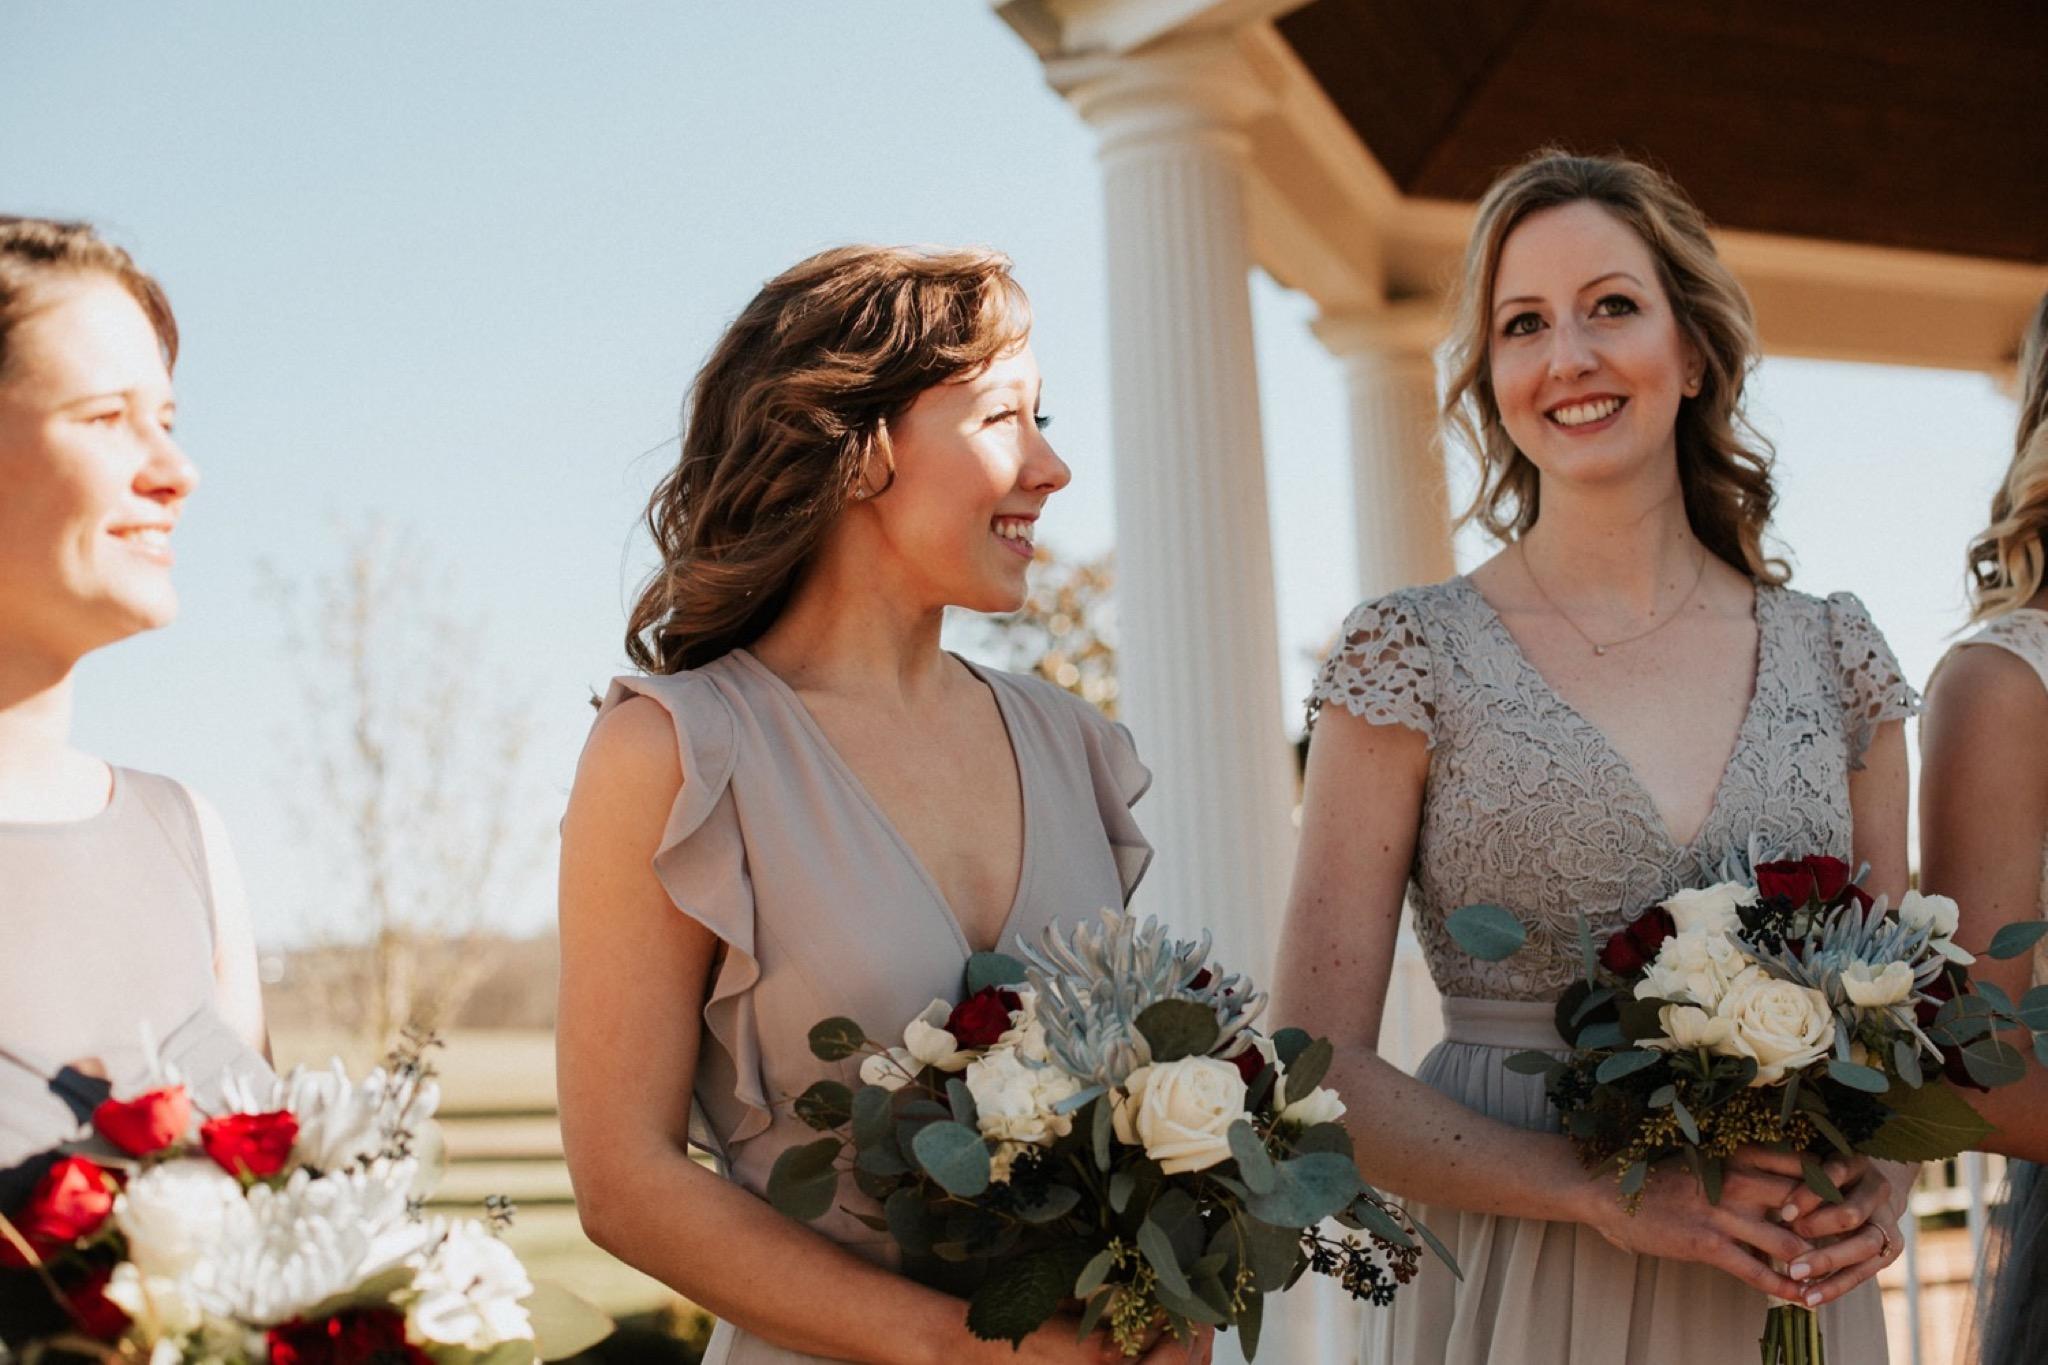 41_West Manor Estate Weddings - Pat Cori Photography-87_Ceremony_VirginiaWeddingPhotographer_PatCoriPhotography_WestManorEstate_Wedding.jpg